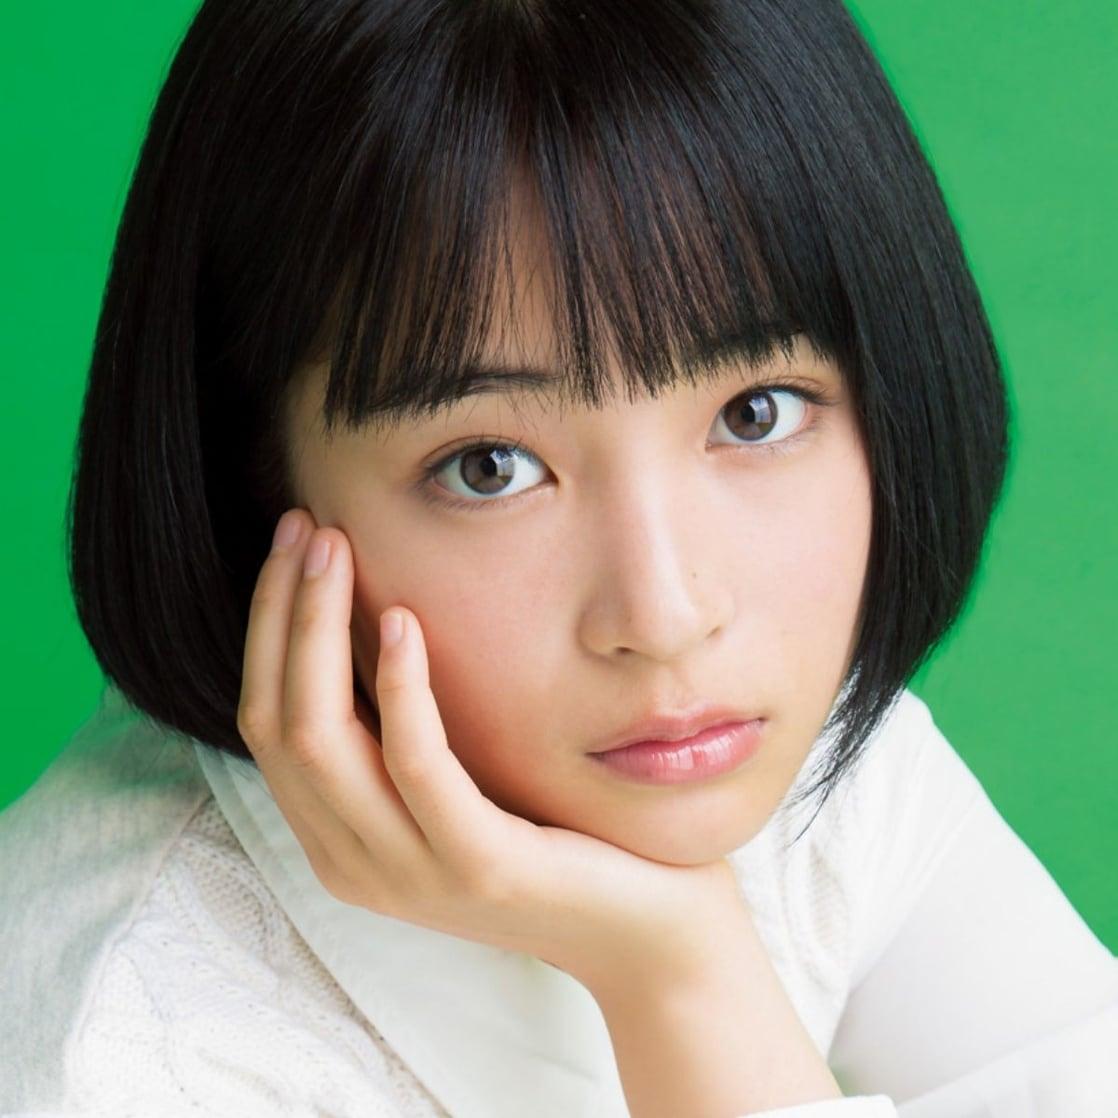 Rena morikawa 2 of 3 fd1965 6